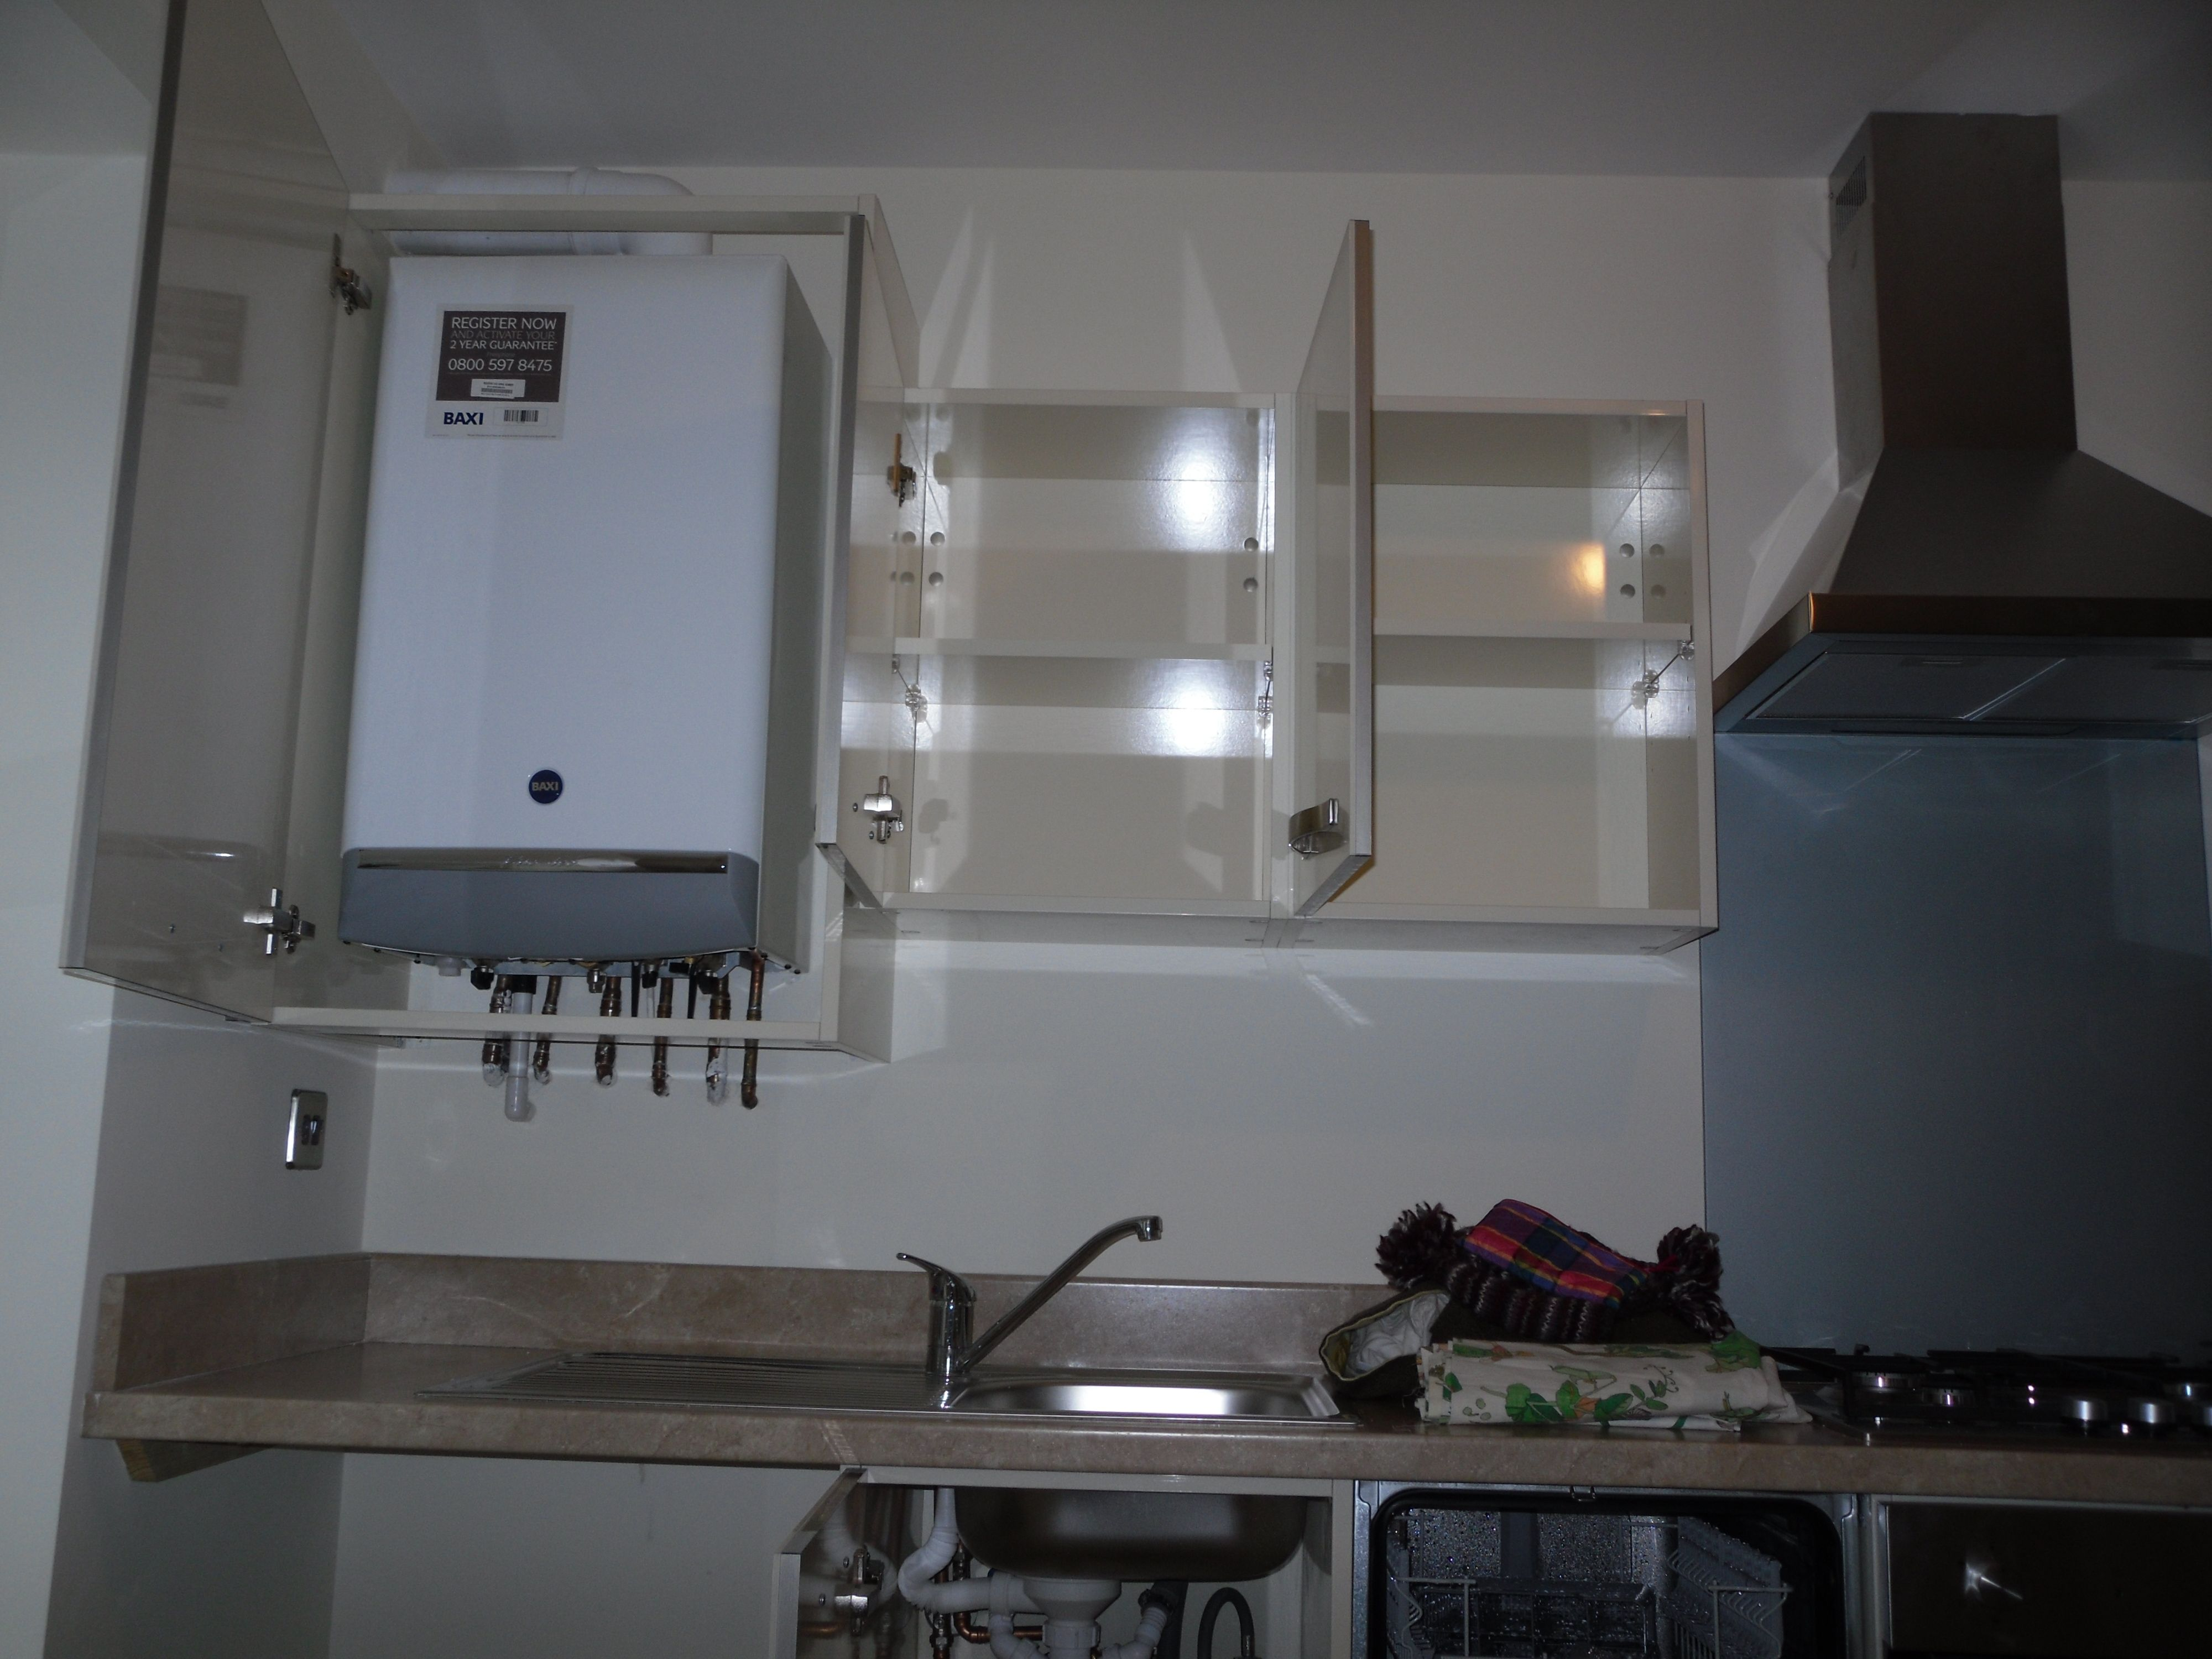 Inside Boiler Sink Dishwasher Cupboards Baxi Combi Boiler Bit Slow To Heat Water Black Dishwasher Kitchen Dishwasher Kitchen Remodel